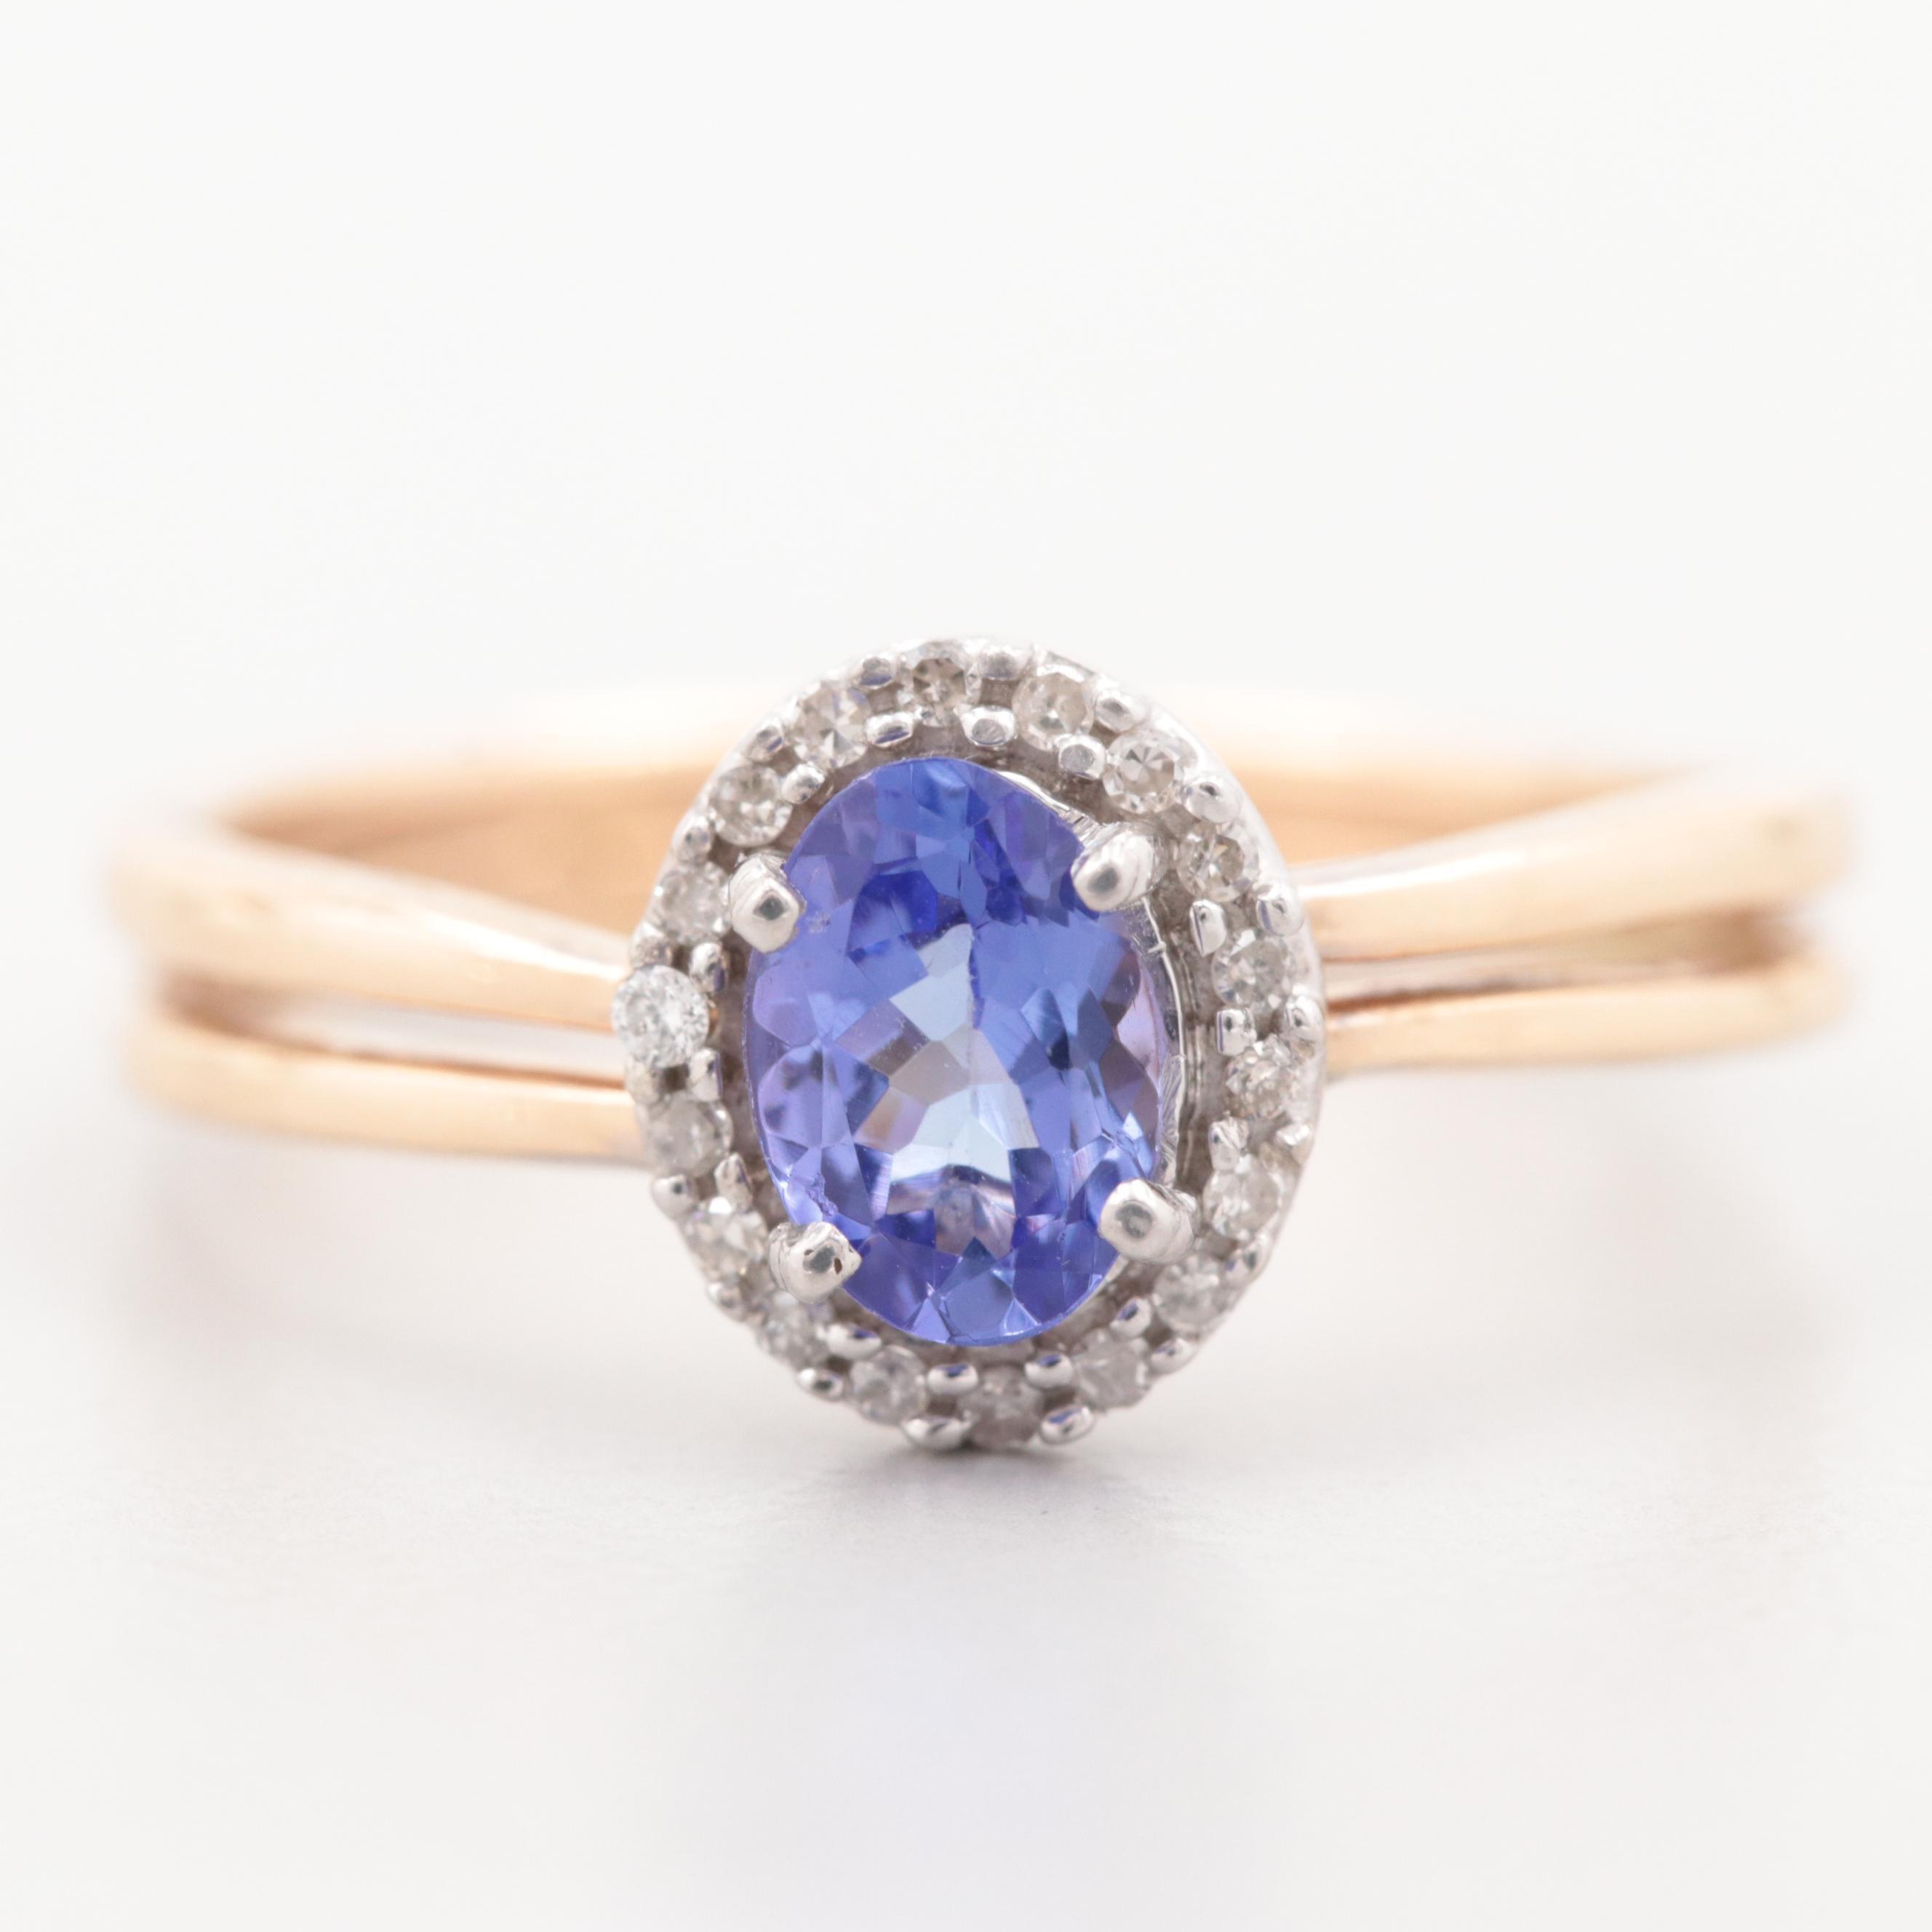 14K Yellow Gold Tanzanite Ring with Diamond Halo